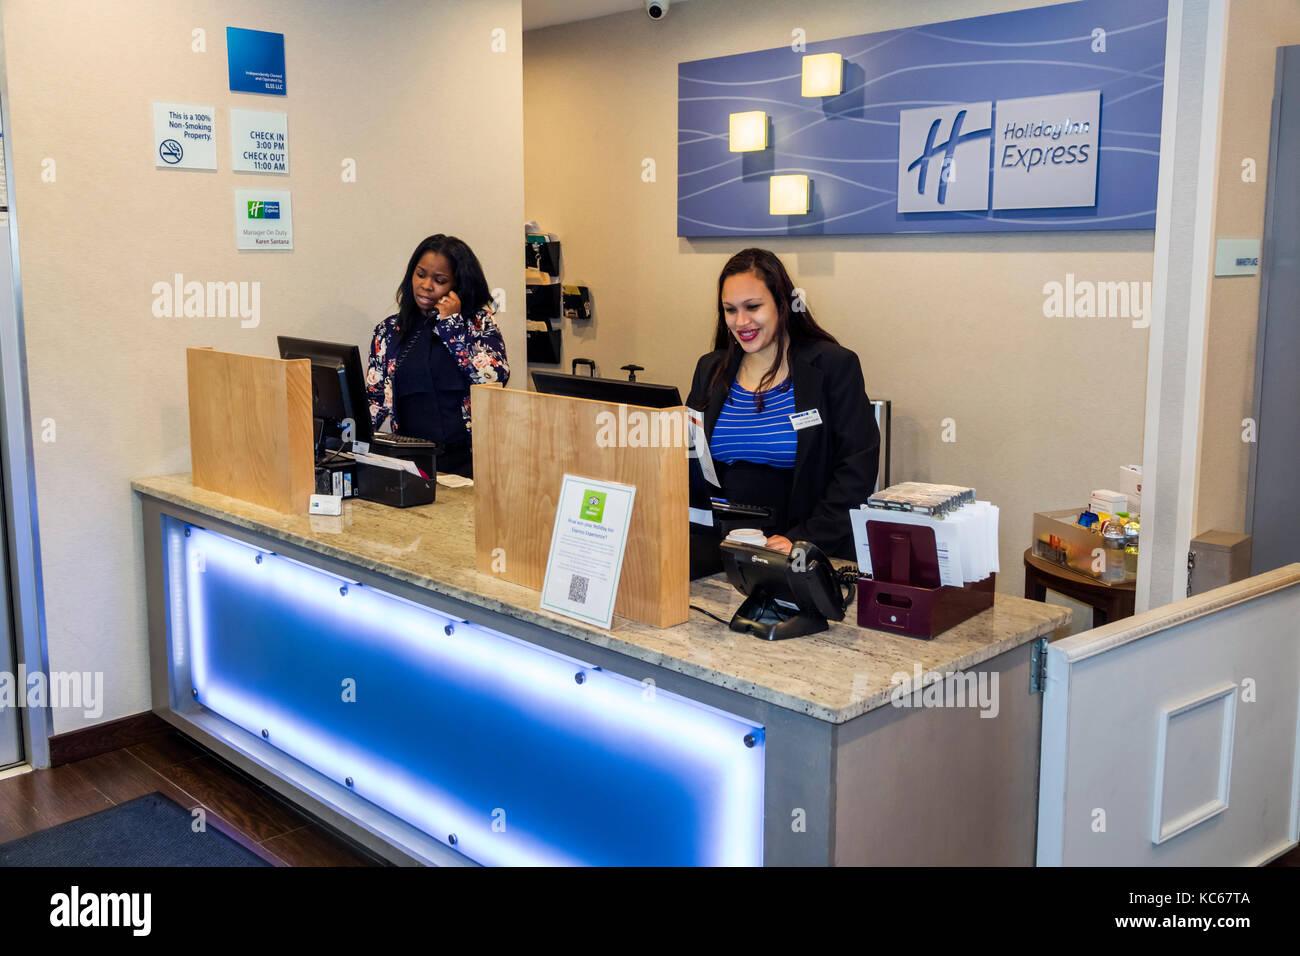 Superior Silver Spring Maryland Holiday Inn Express Hotel Front Desk Registration  Black Woman Clerk Job Lobby Interior Employee Idea